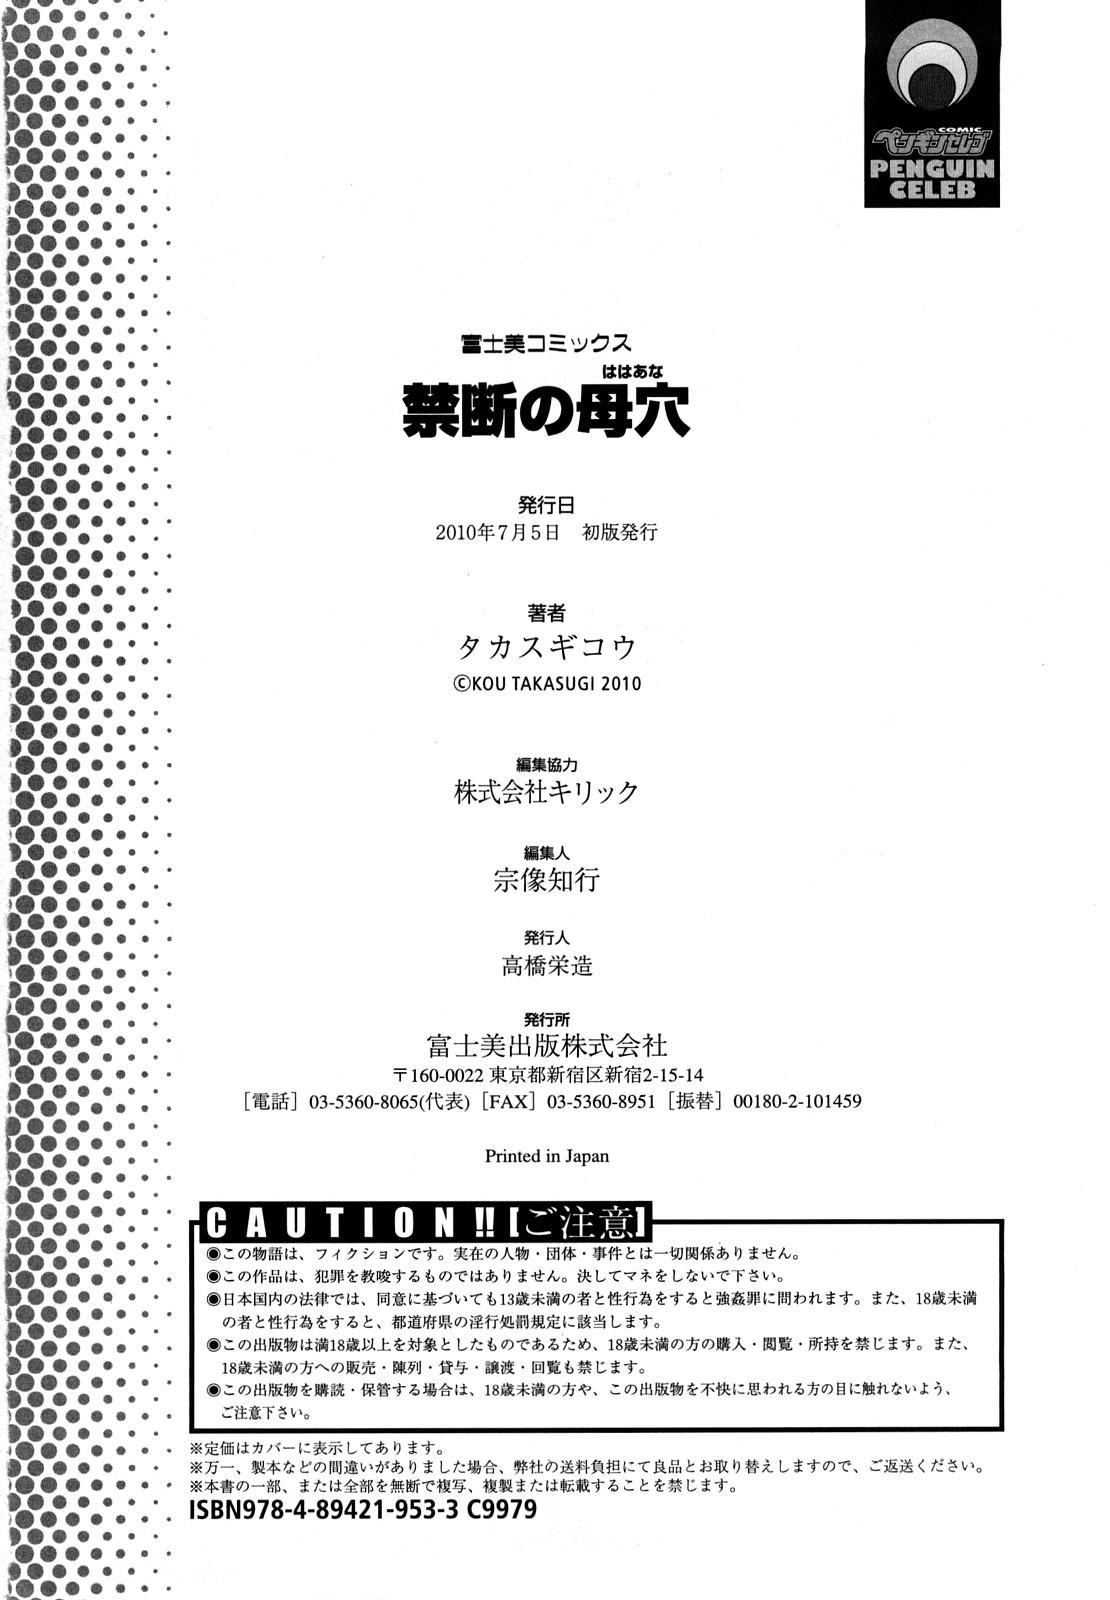 [Takasugi Kou] Kindan no Haha-Ana - Immorality Love-Hole [Decensored] 211